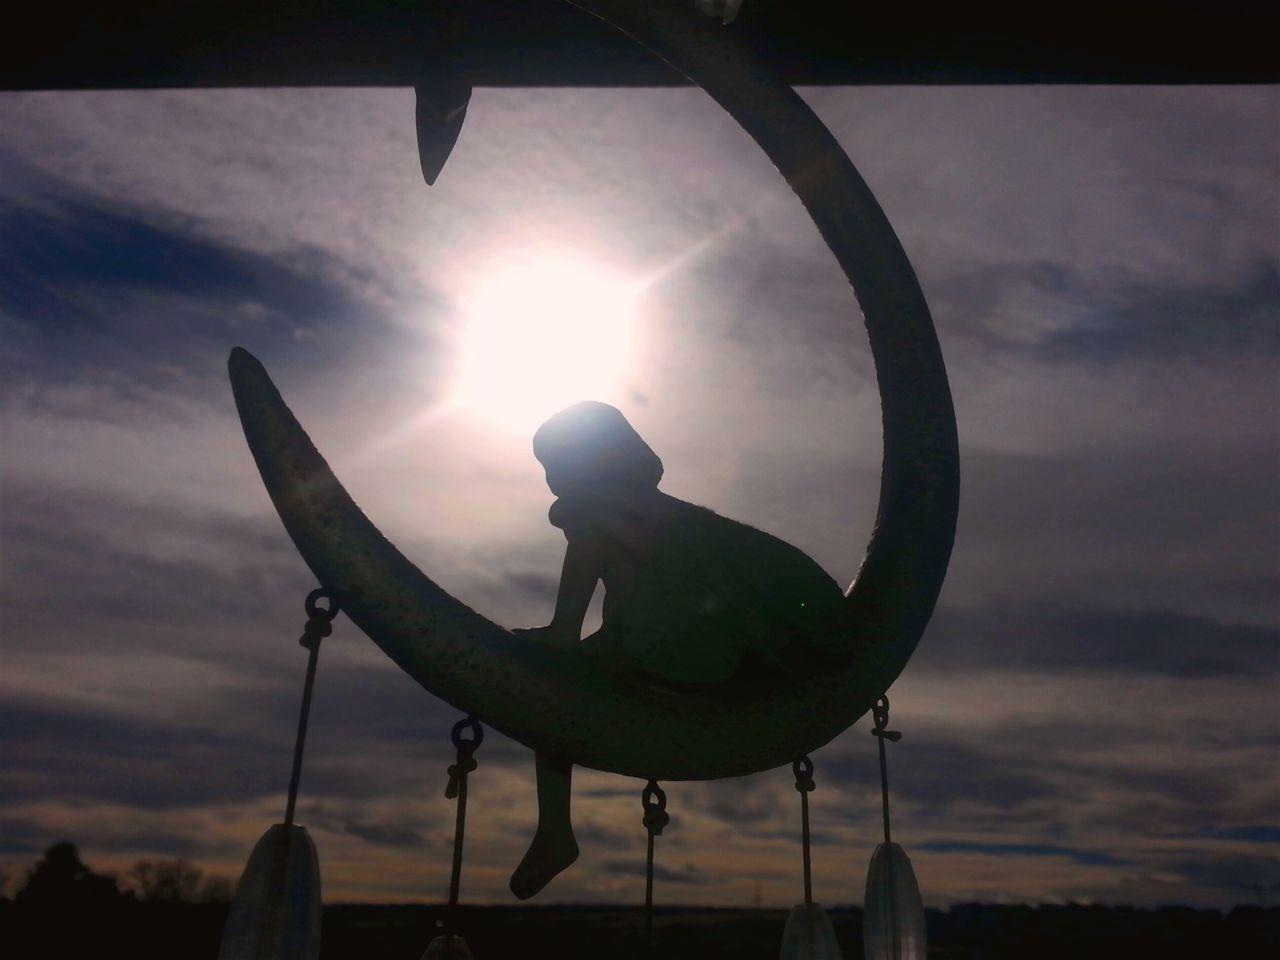 """Fairy chimes at sunset"" (2017) Silhouette Outdoors Sky Cloud - Sky Sunset Dusky Sky Outdoor Photography Tranquility Windchime Sunburst Parker Colorado"